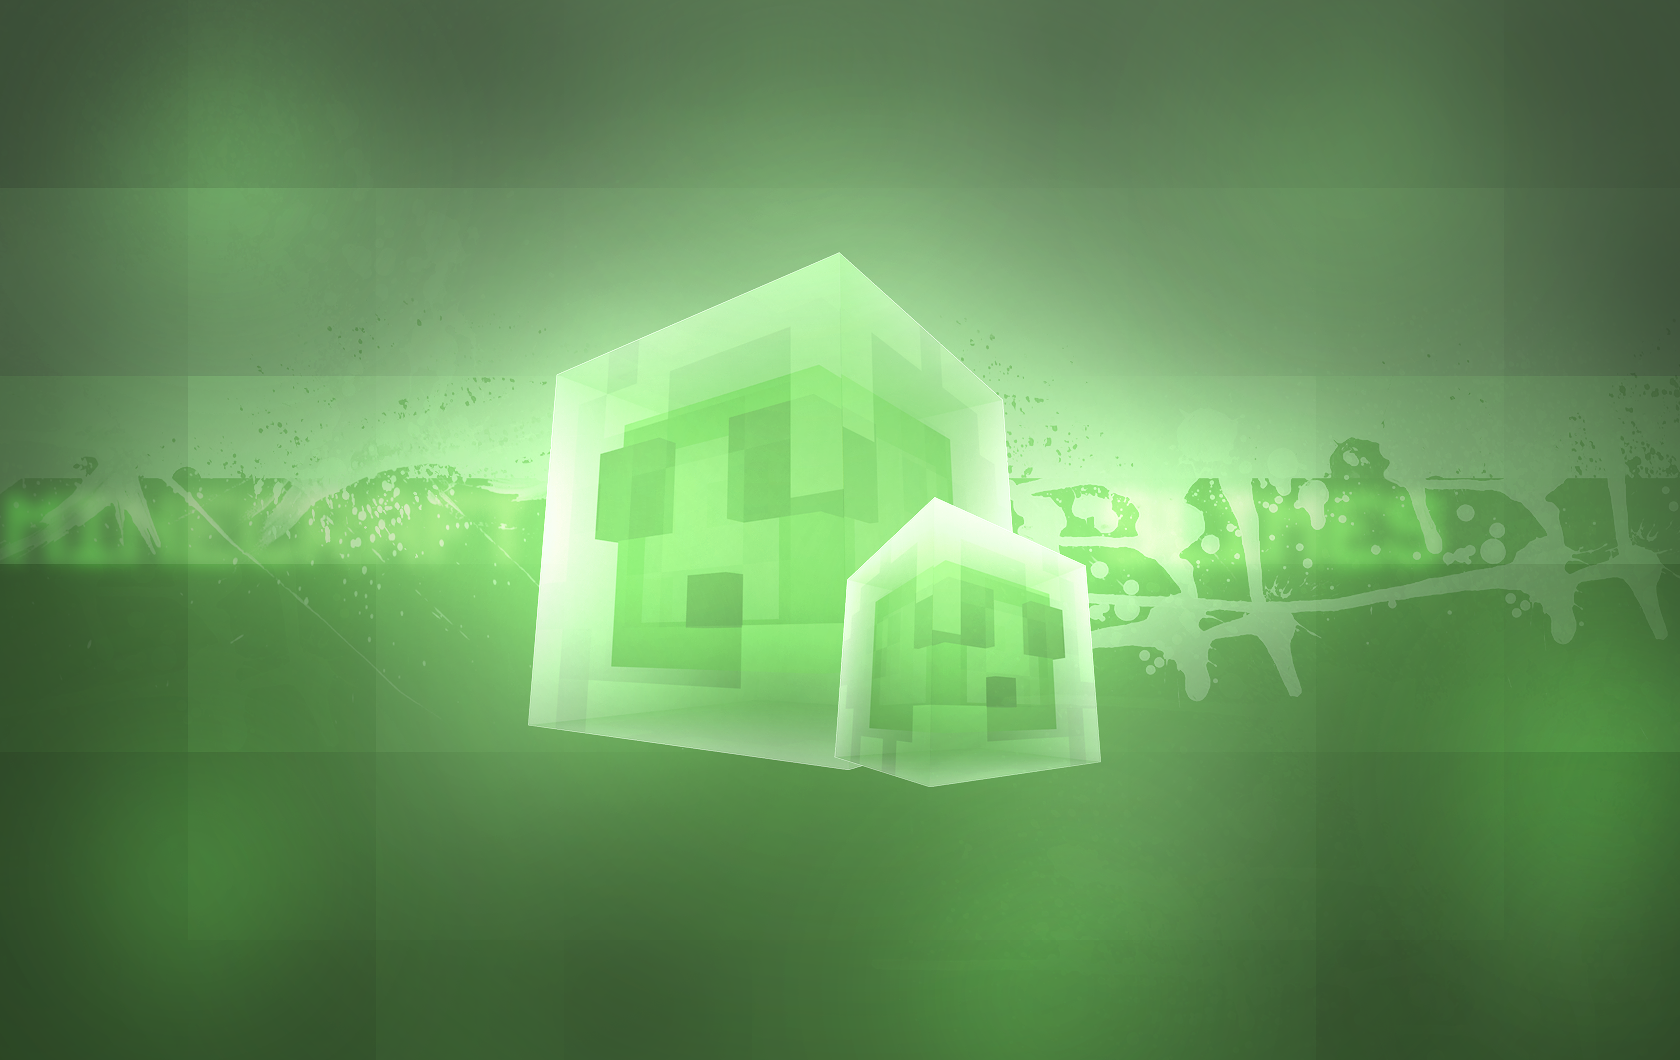 Minecraft 'Slimes' wallpaper by MikasDA